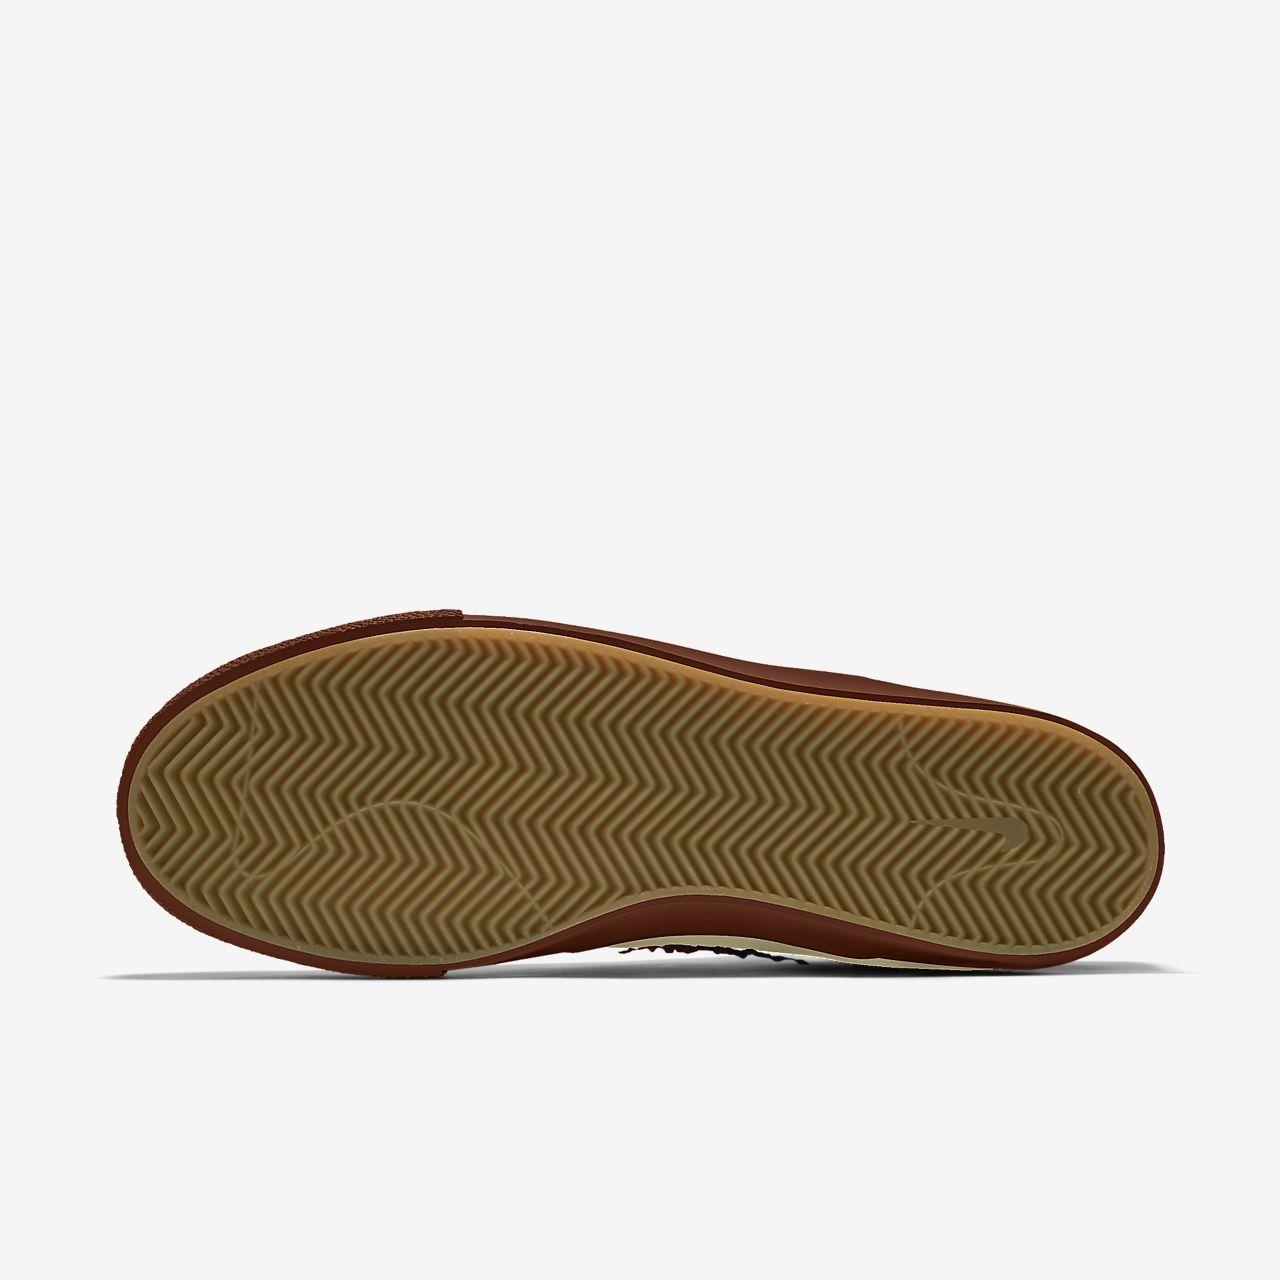 Nike Zoom Stefan Janoski RM Premium By You personalisierbarer Skateboardschuh